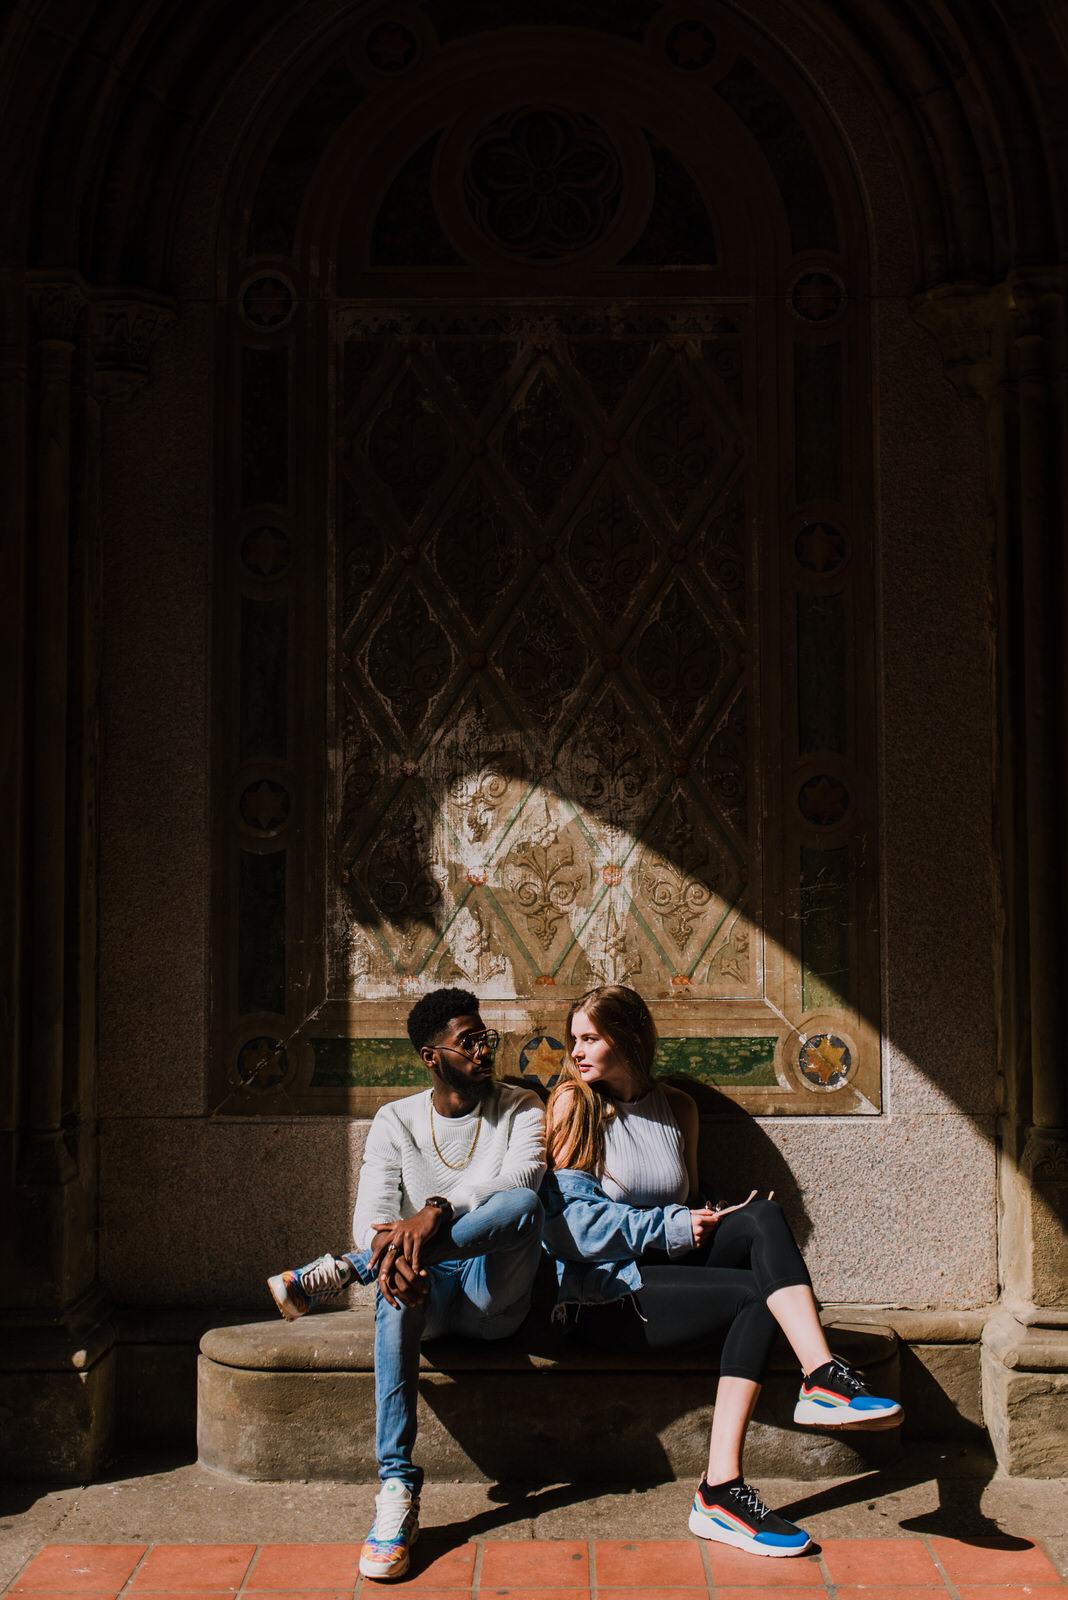 central park engagement shoot, NYC wedding photographer, NYC elopement, elopement photographer New York (13).jpg